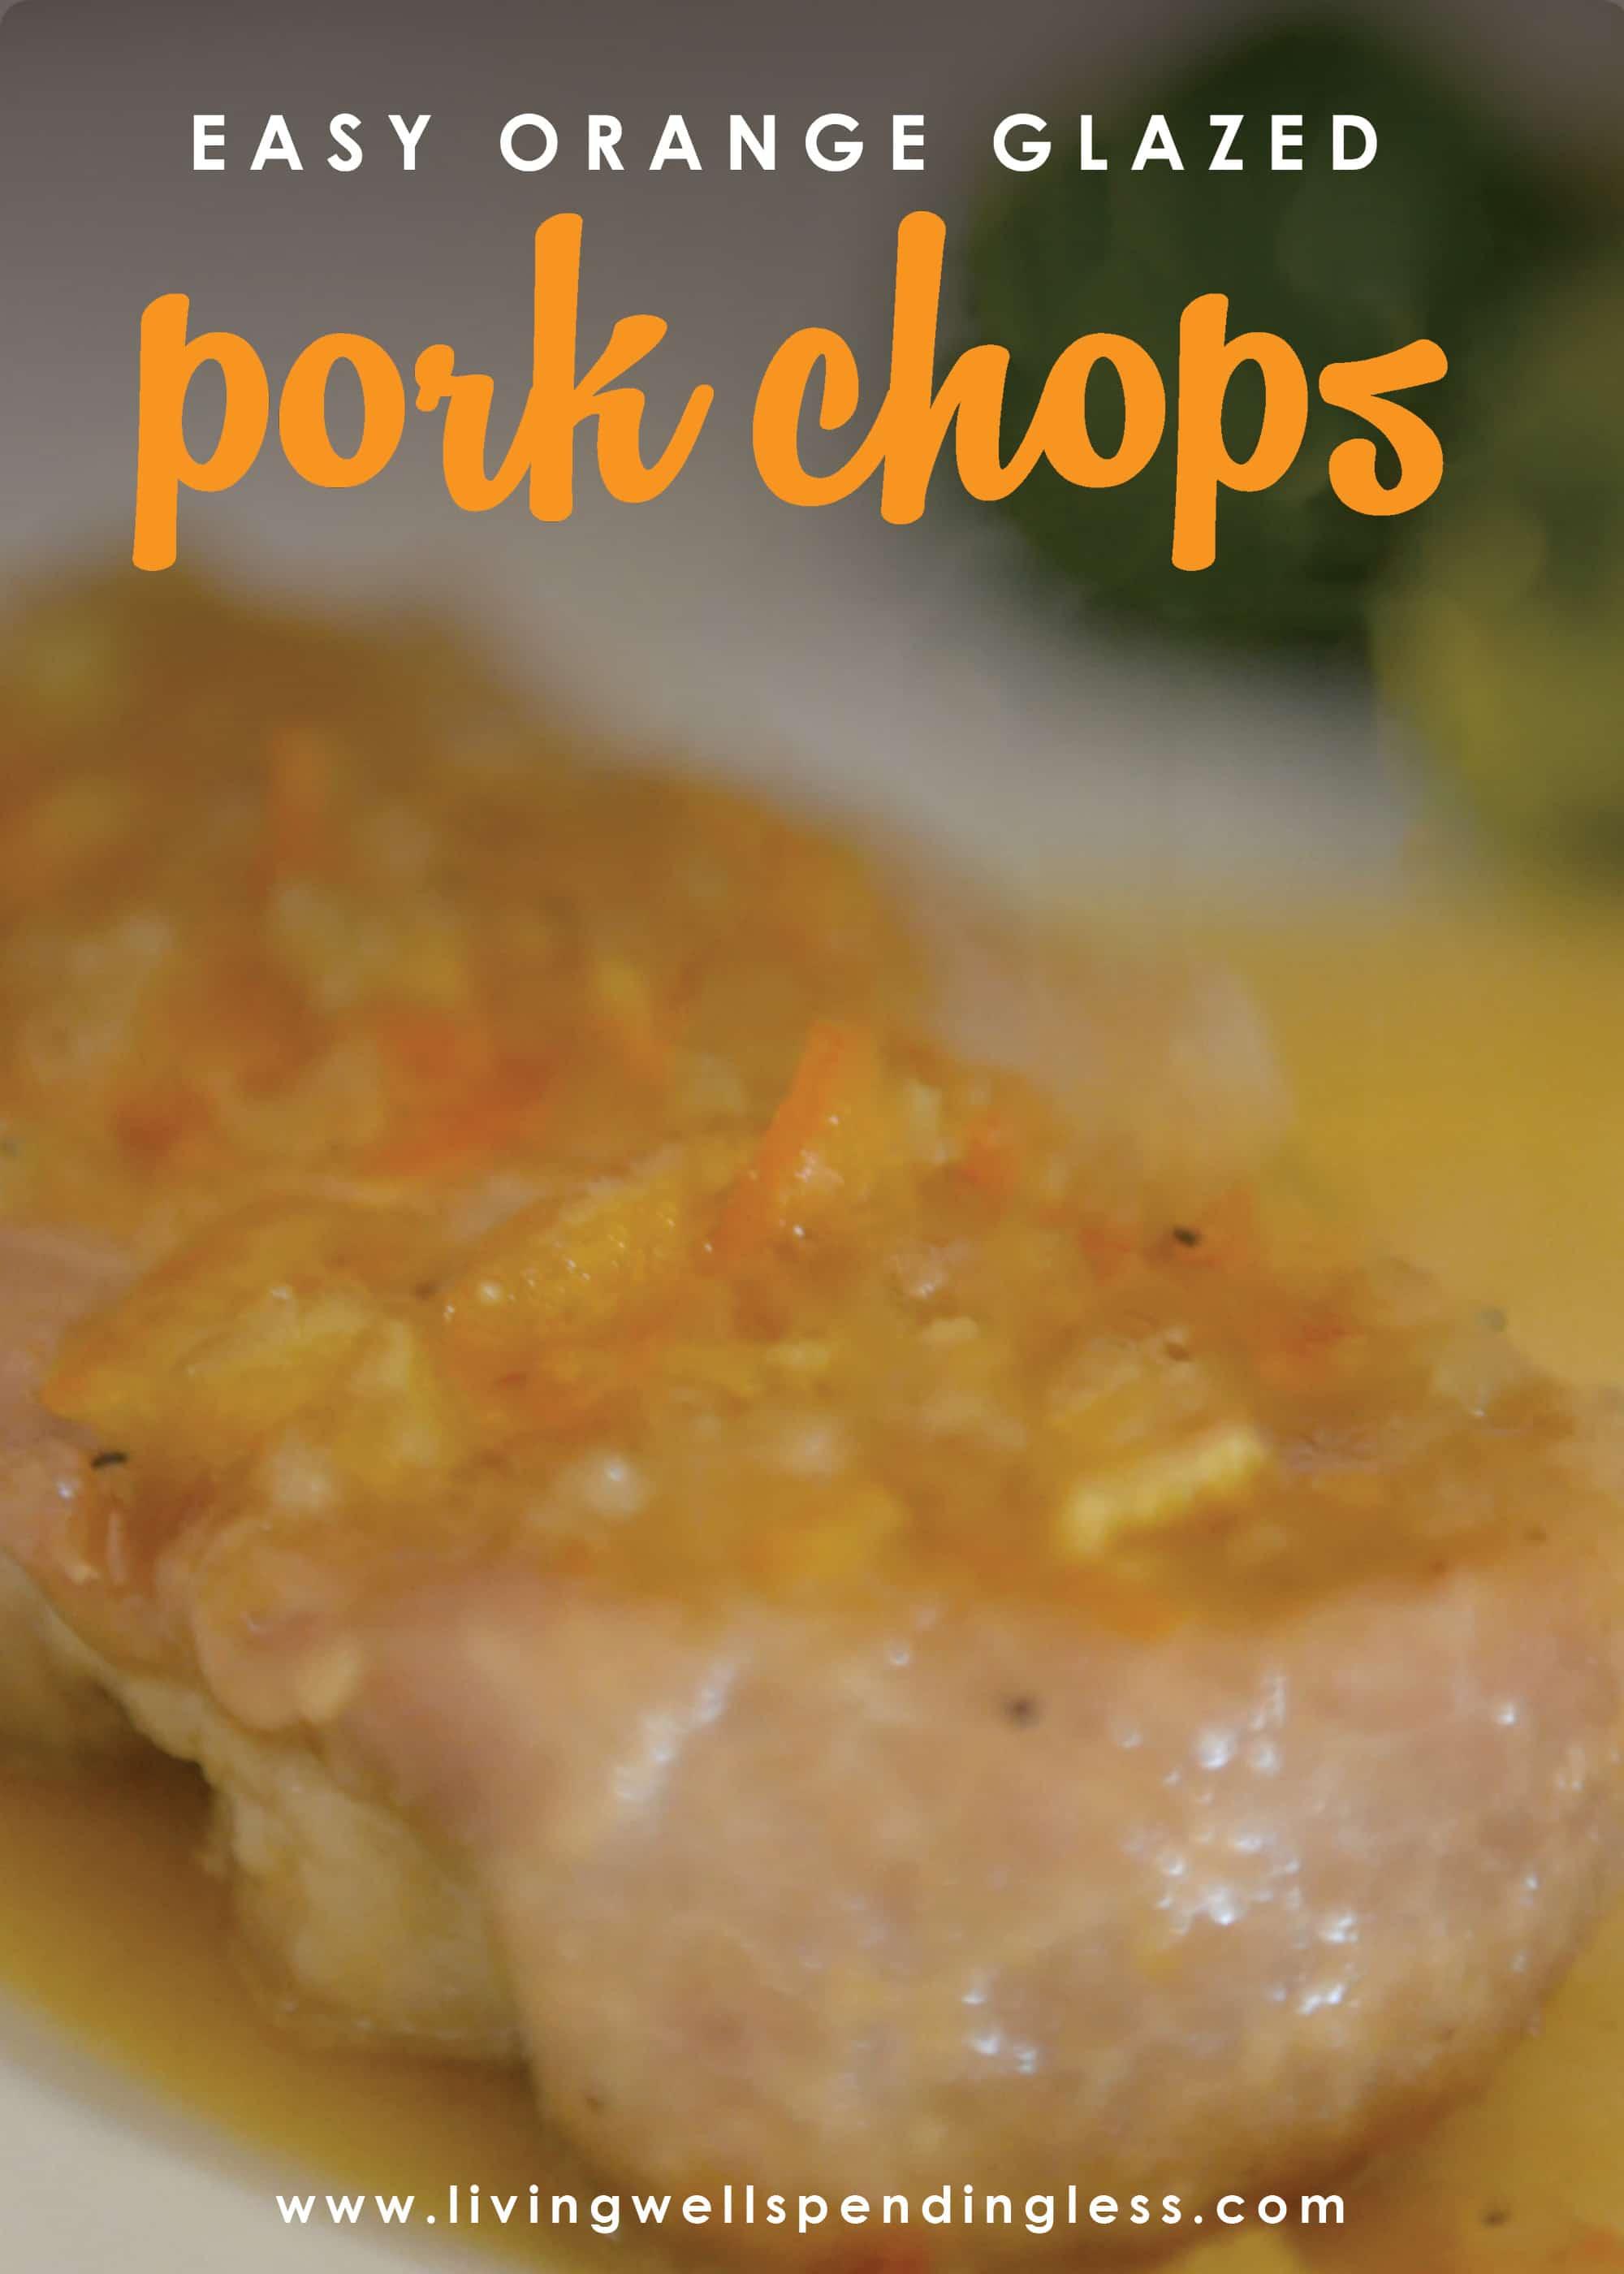 These freezer-friendly orange glazed pork chops take just minutes to prep but taste juicy and delicious. Enjoy this family pleasing pork chop recipe.